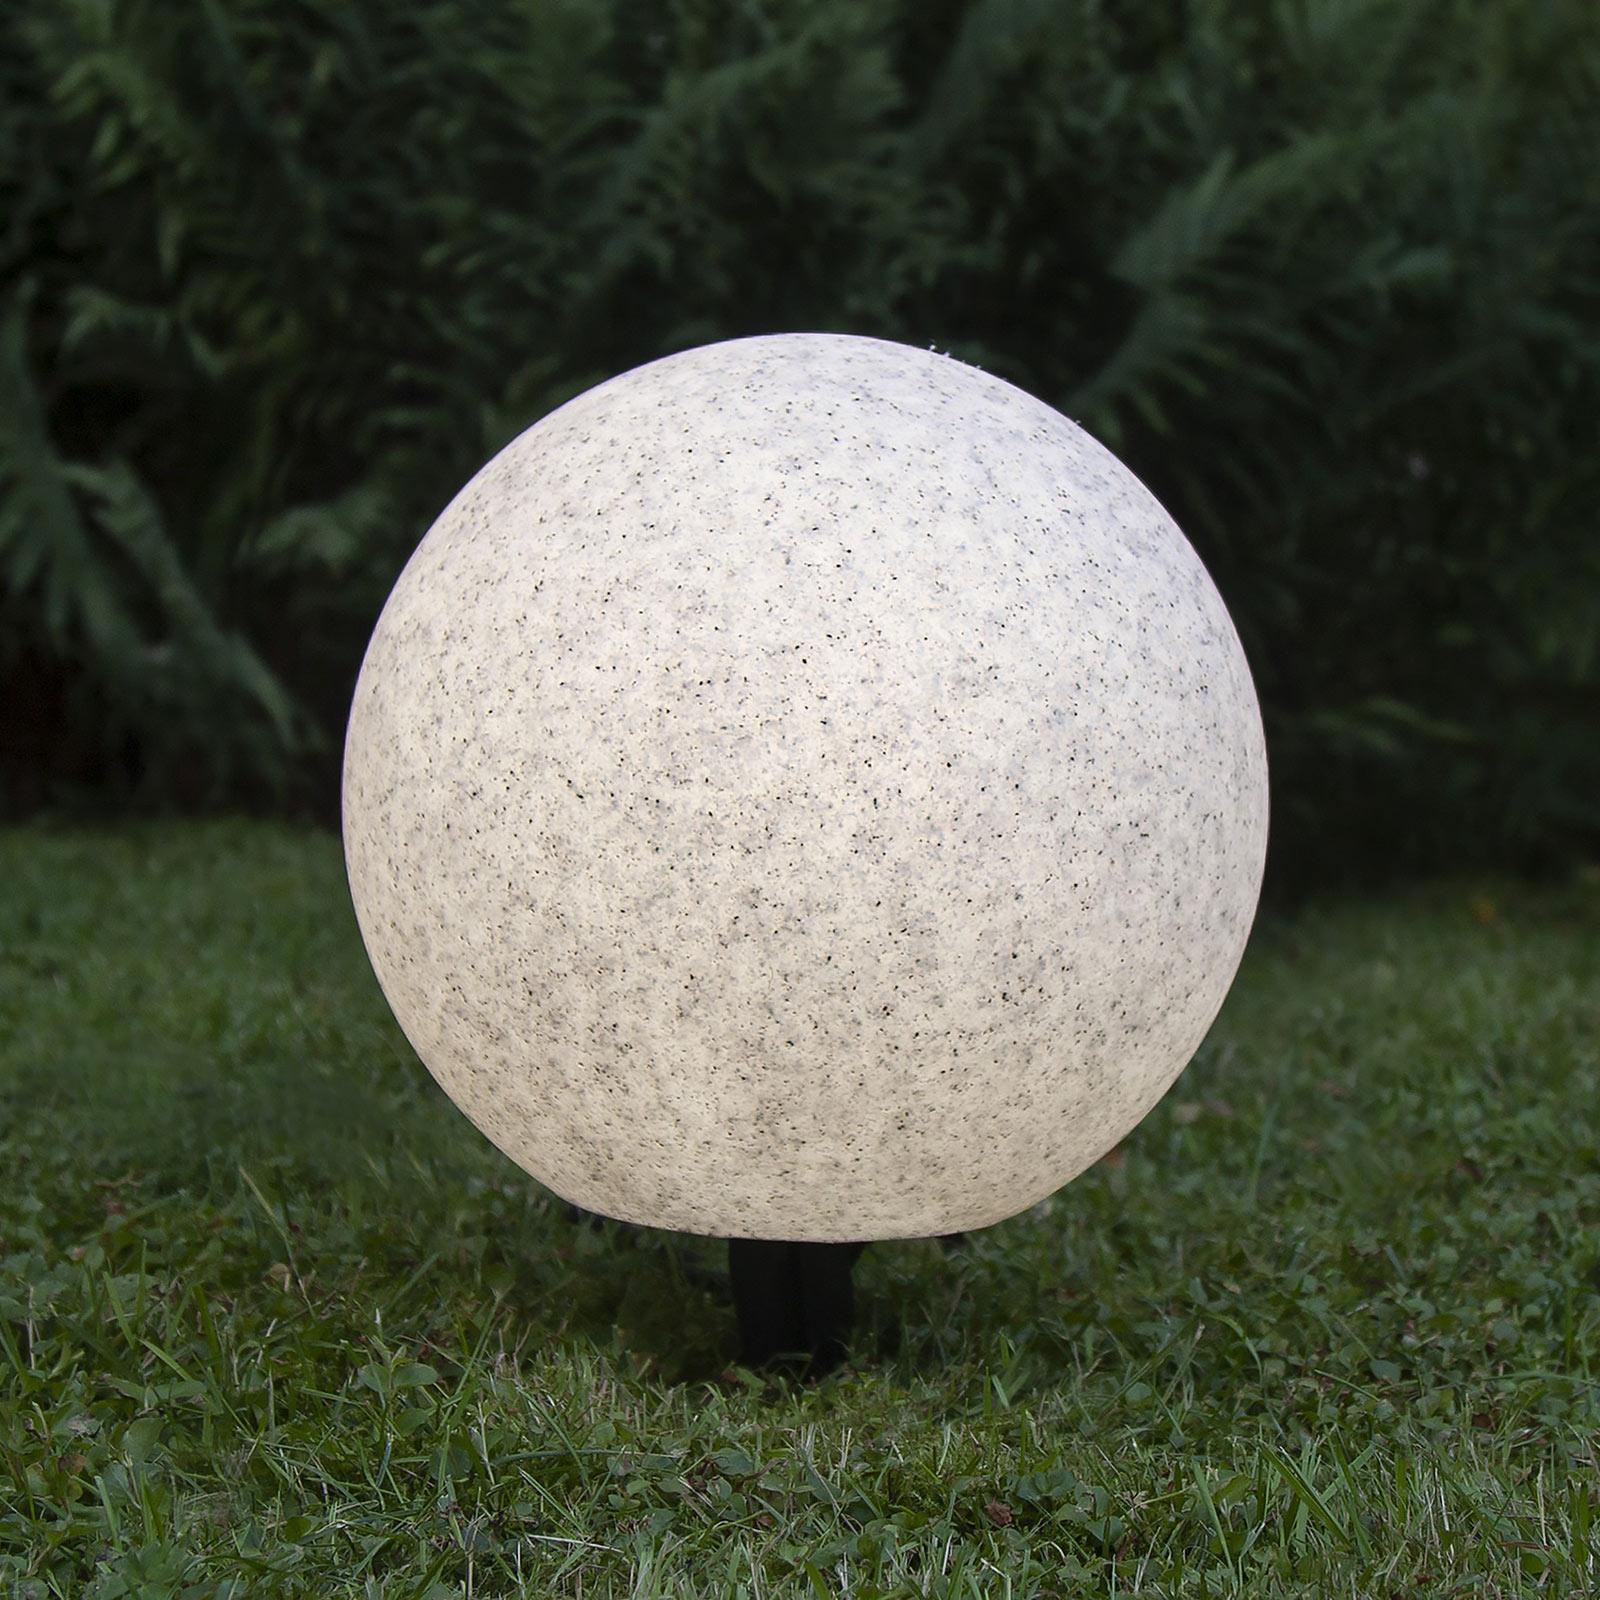 Terrassenleuchte Gardenlight, kugelförmig, Ø 30 cm